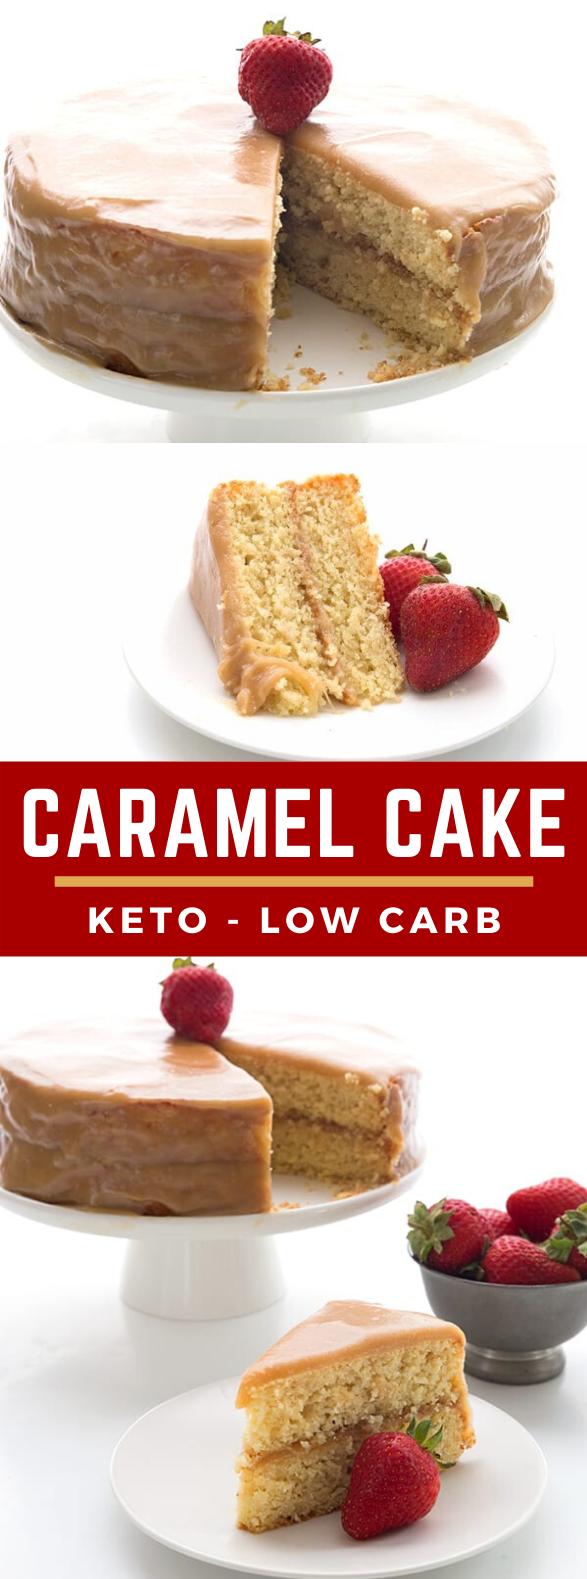 CARAMEL CAKE – KETO LOW CARB RECIPE #healthydessert #sugarfree